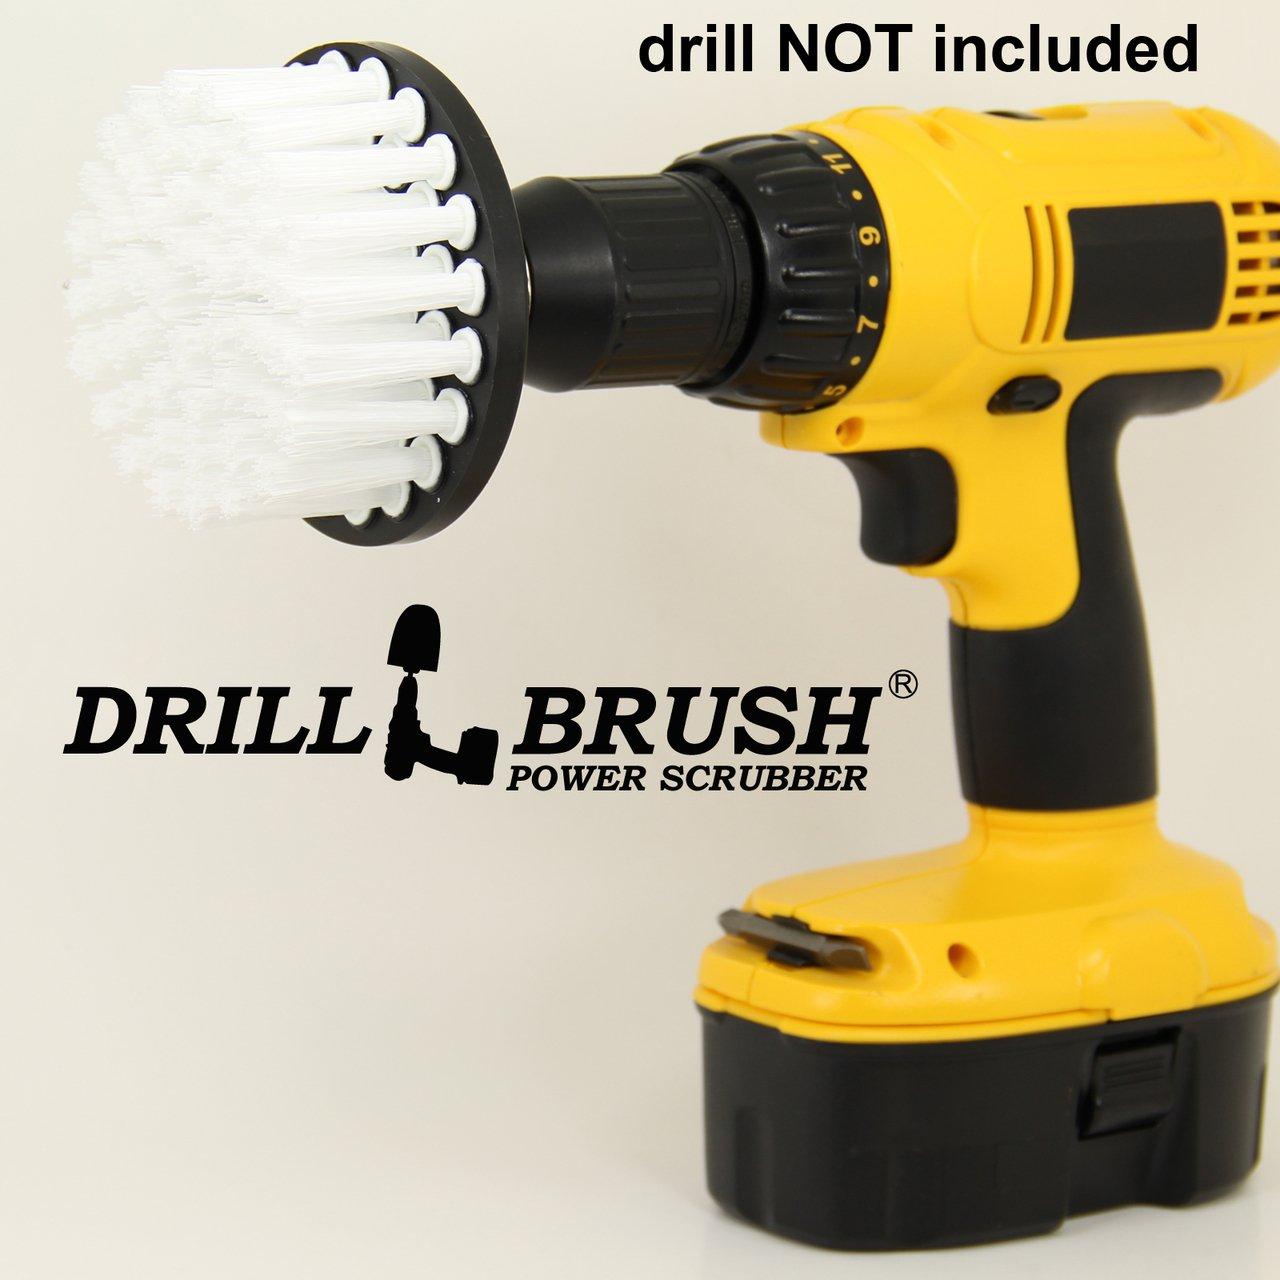 Drillbrush 4インチの長さ毛パワータイル、バスルームのスクラバー B00P854WUG